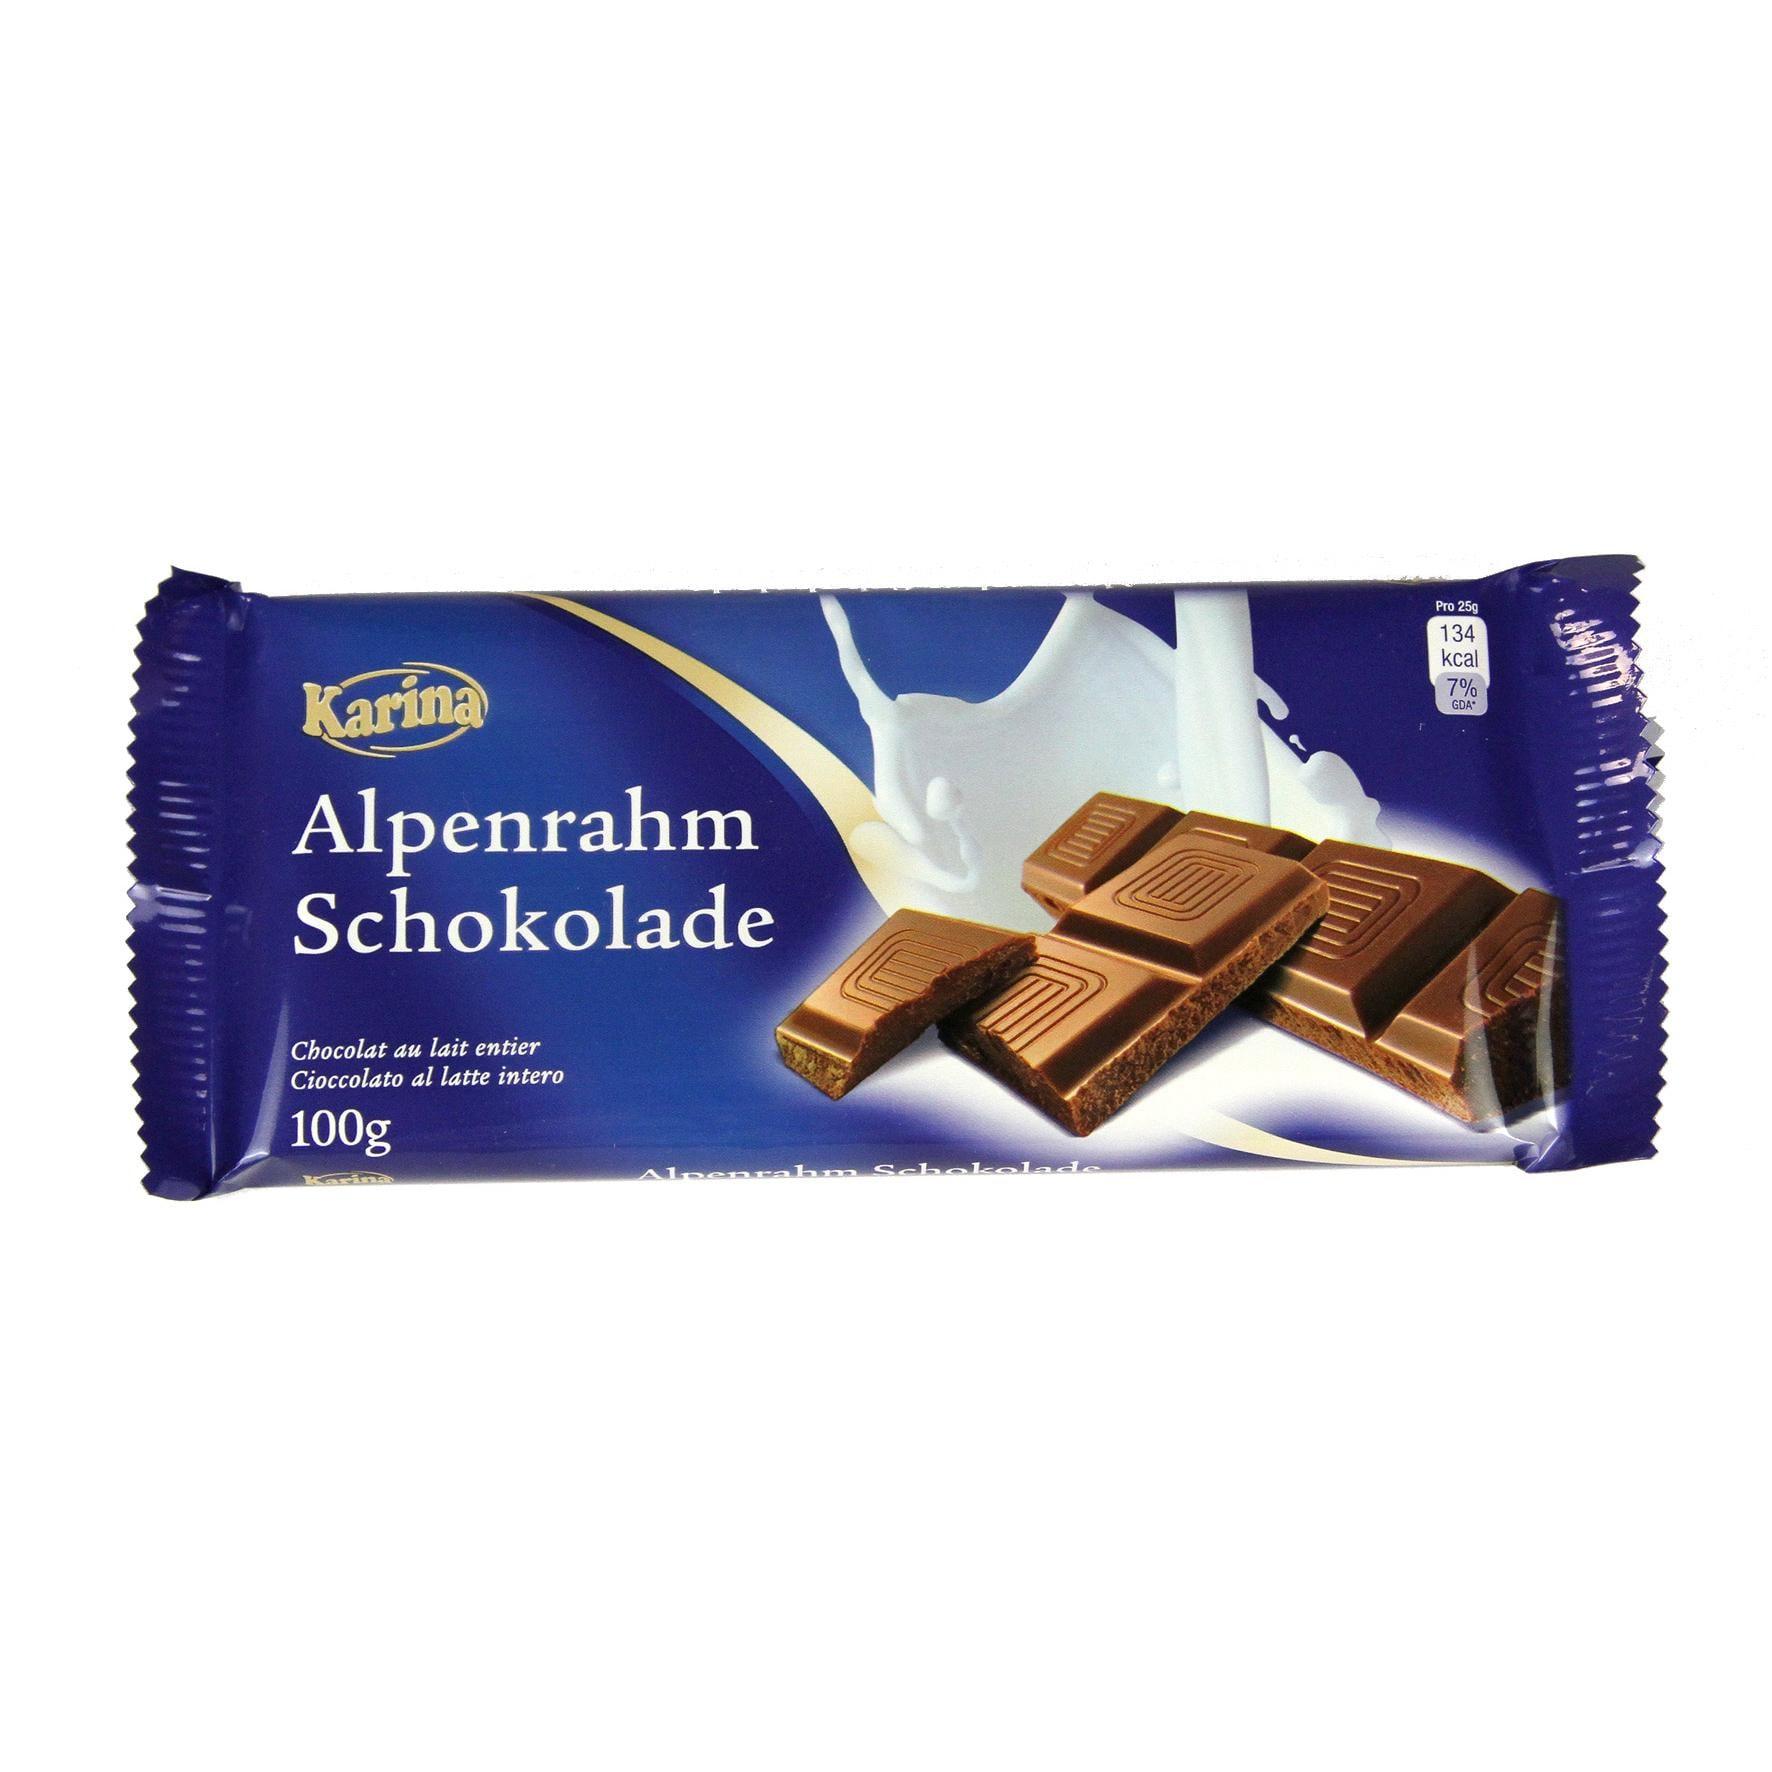 Karina - Alpenrahm-Schokolade - 100g